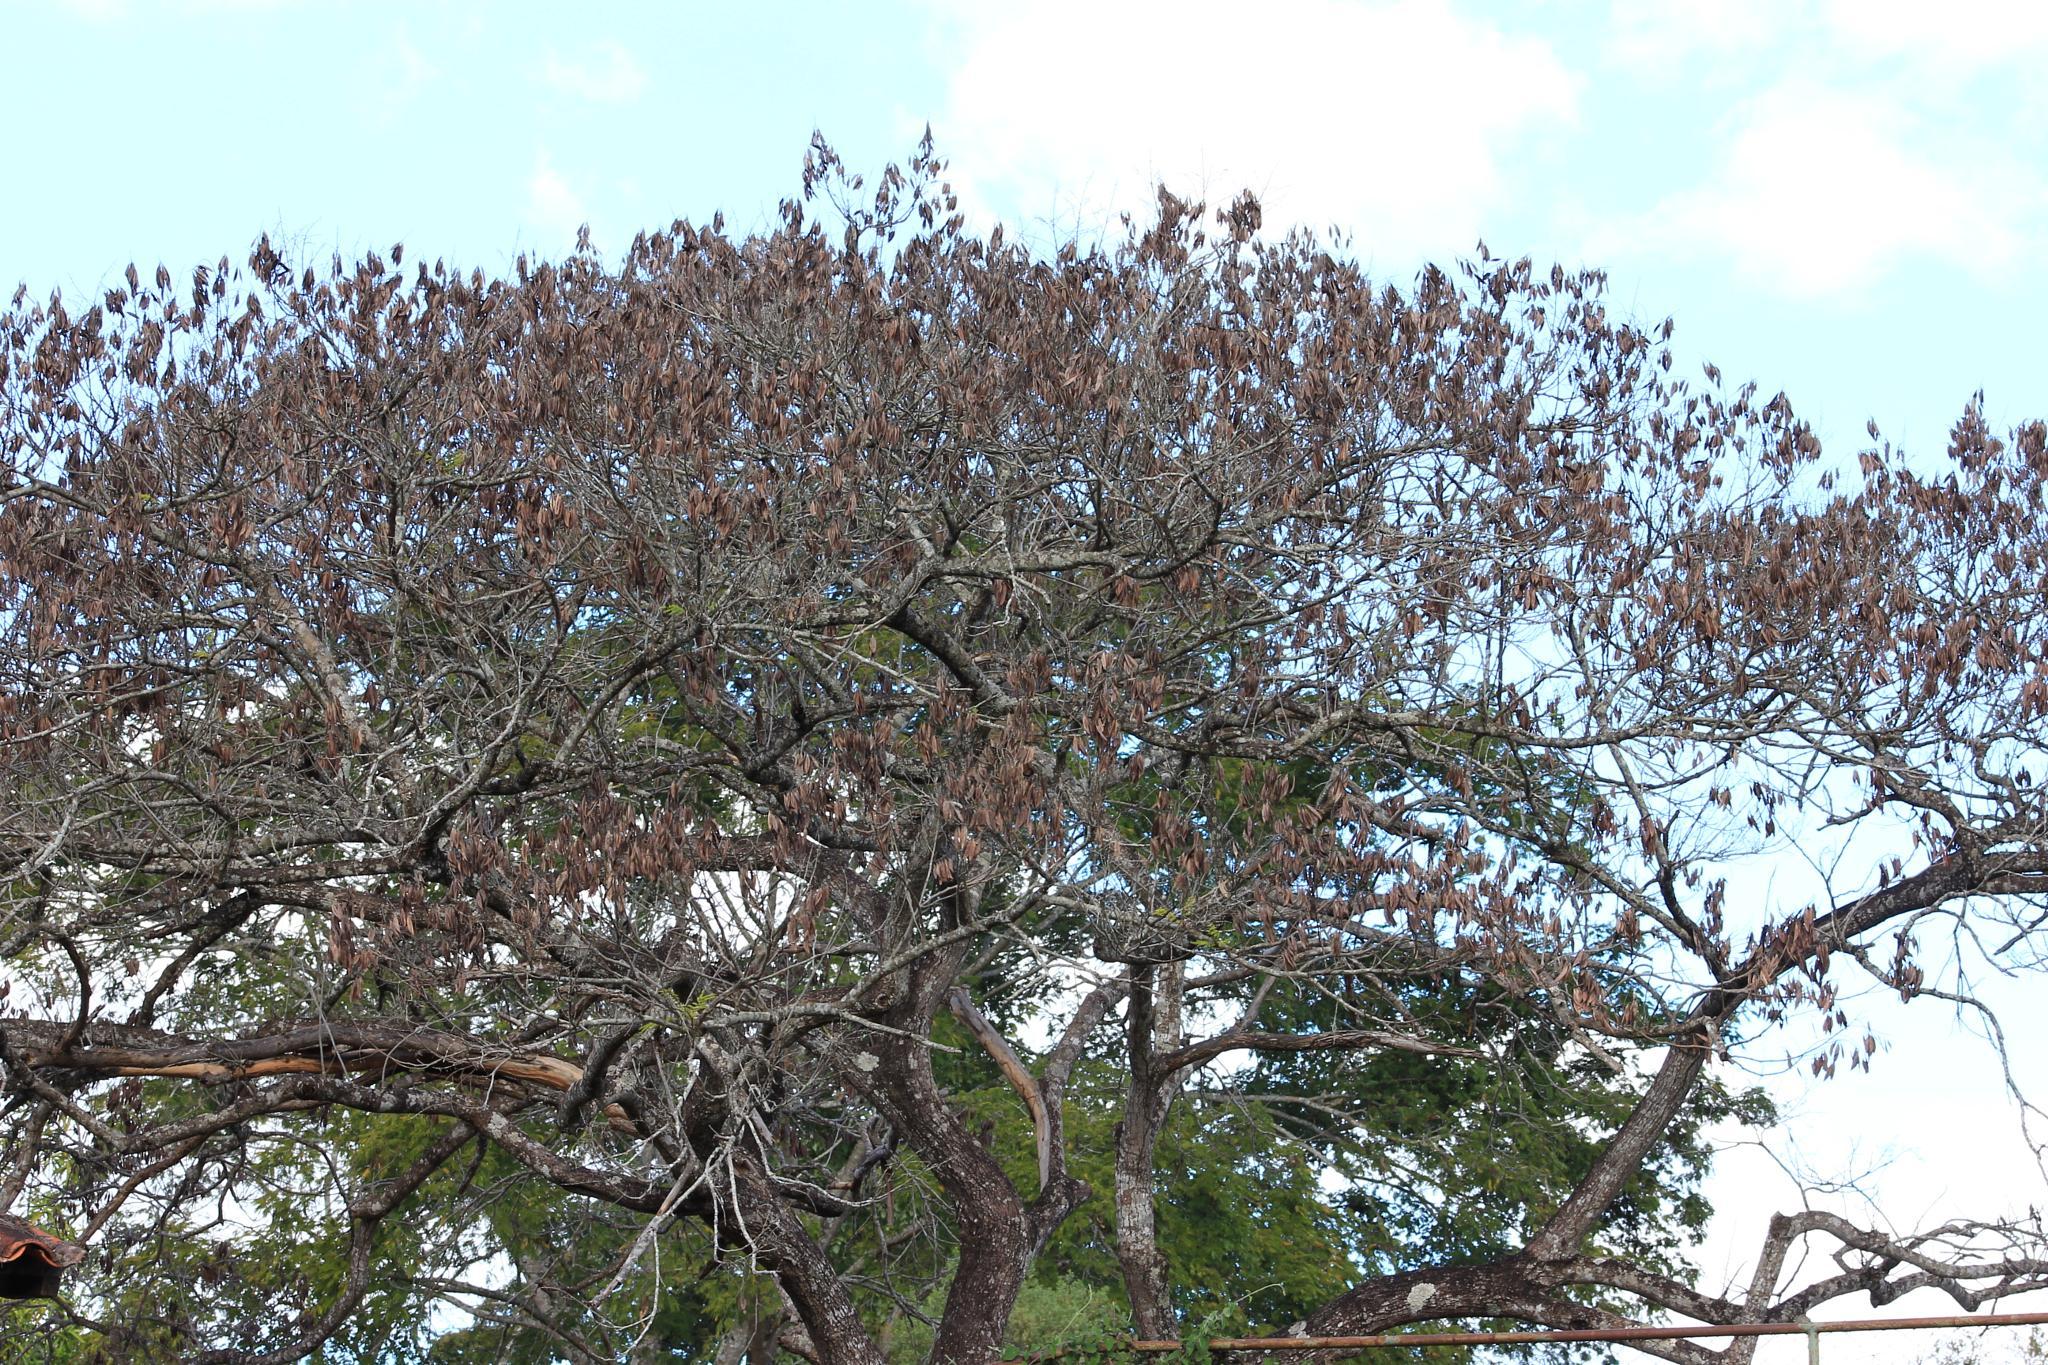 dry trees of the savannah by Ricardo Pacheco